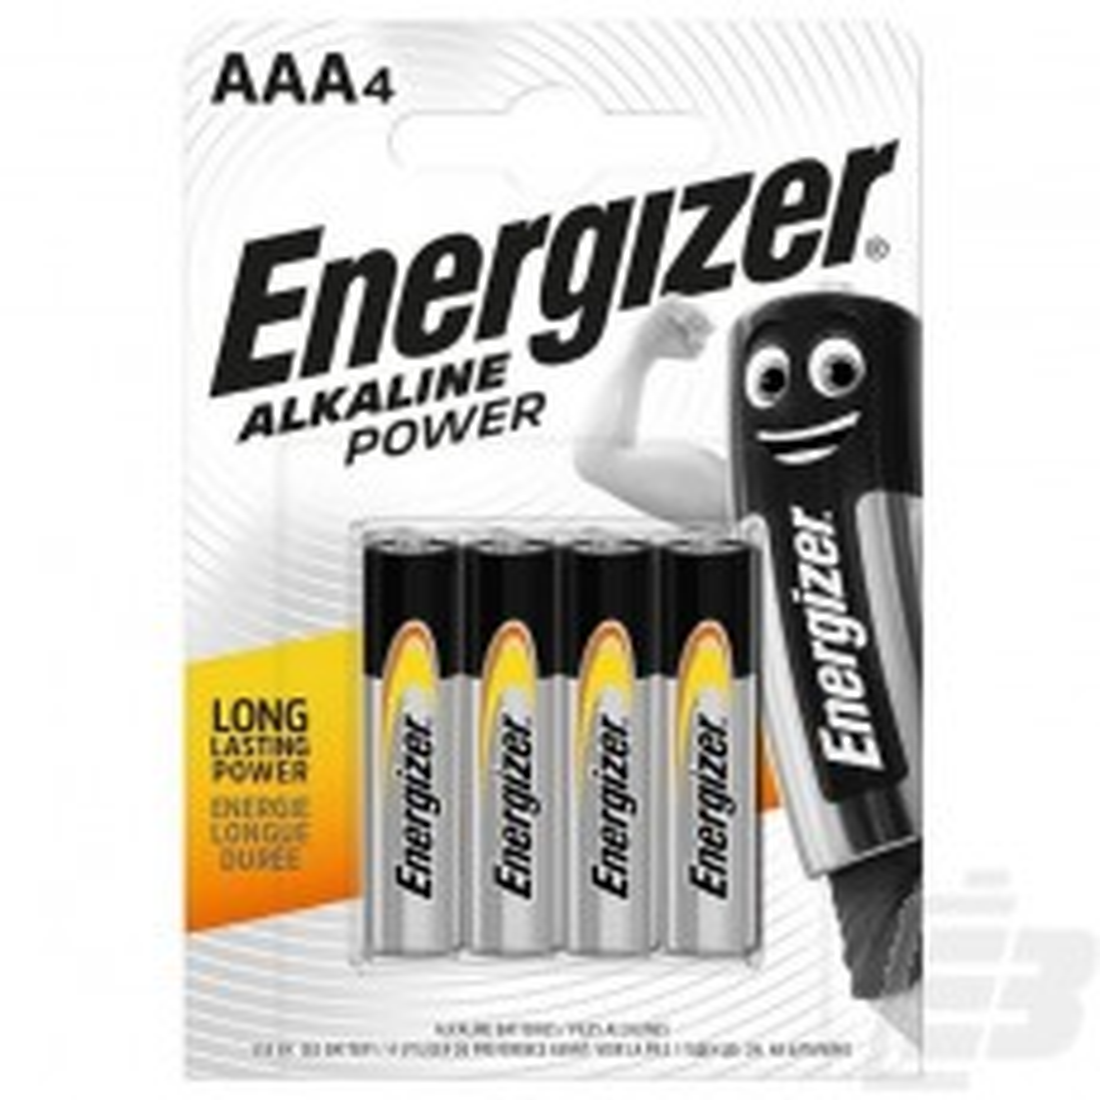 panasonic power AAA